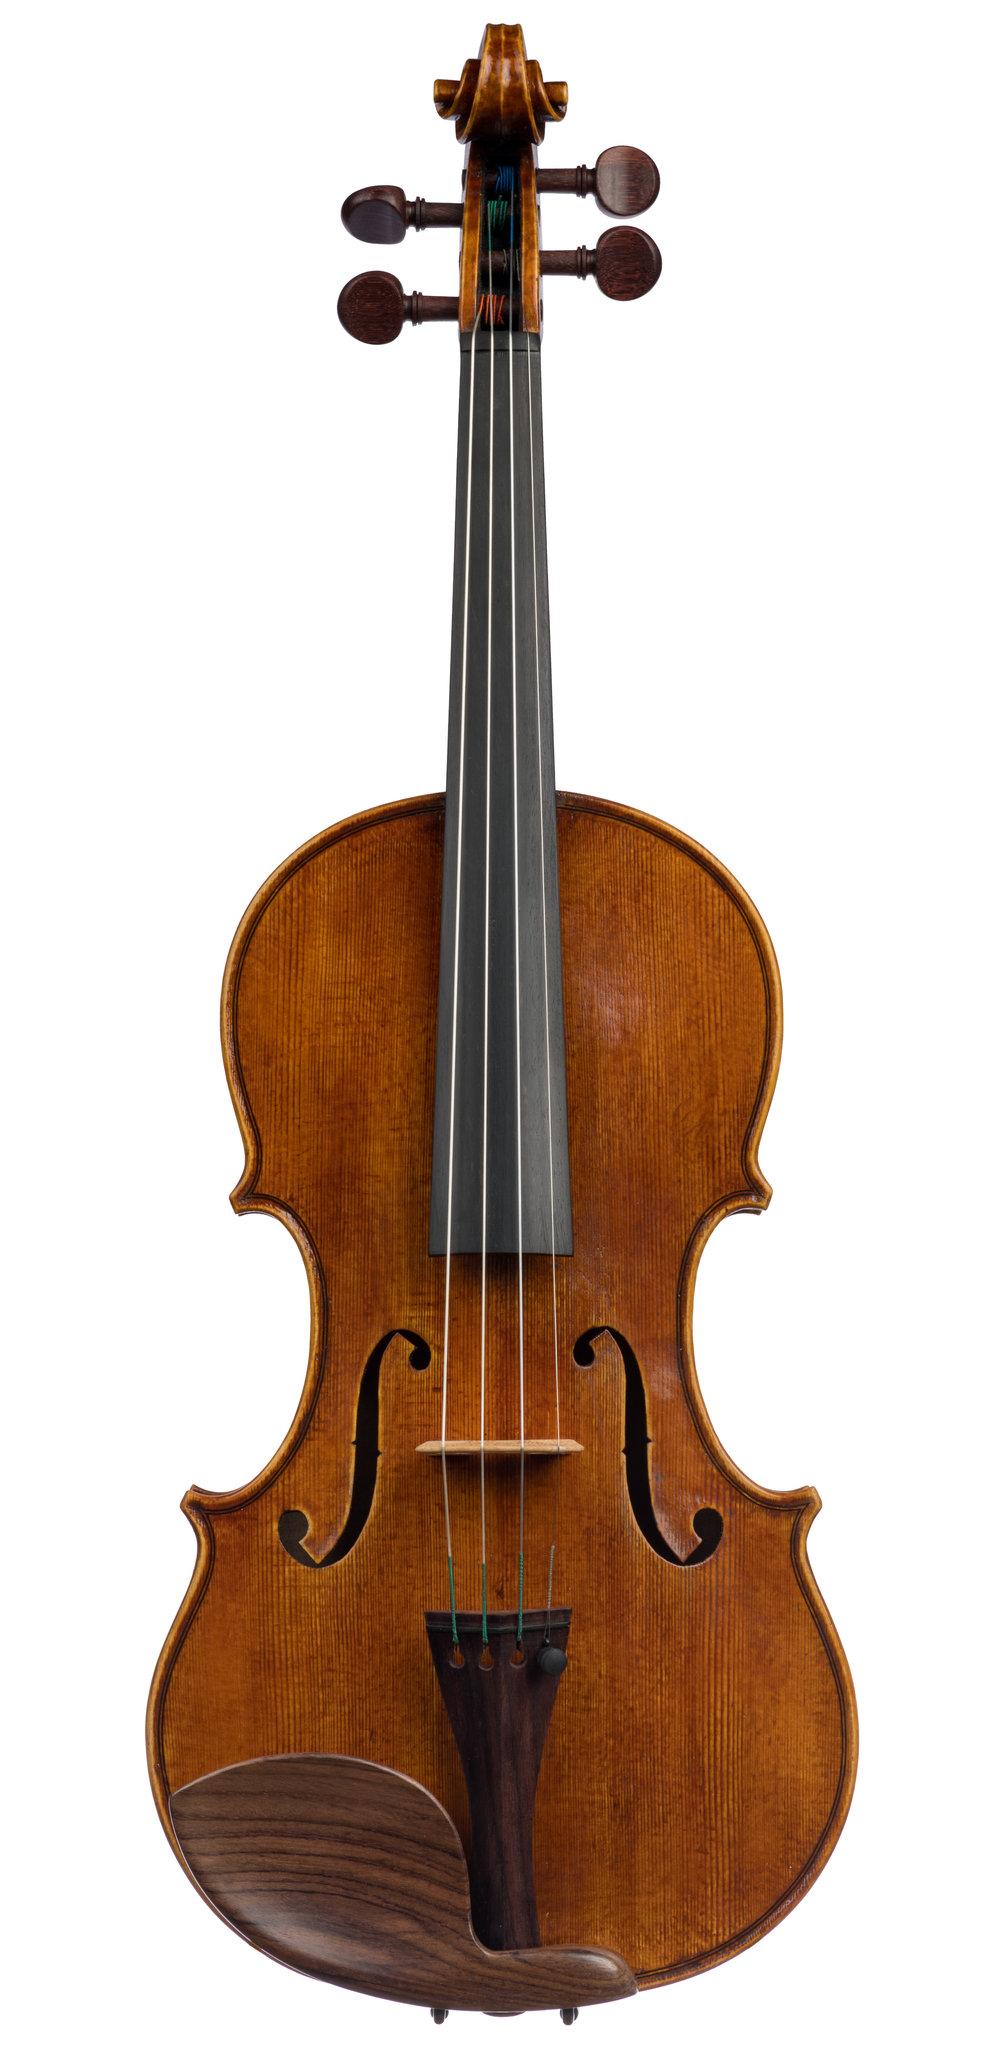 Noah Saunders Scott, Guarneri Model violin, Chicago, 2019 -